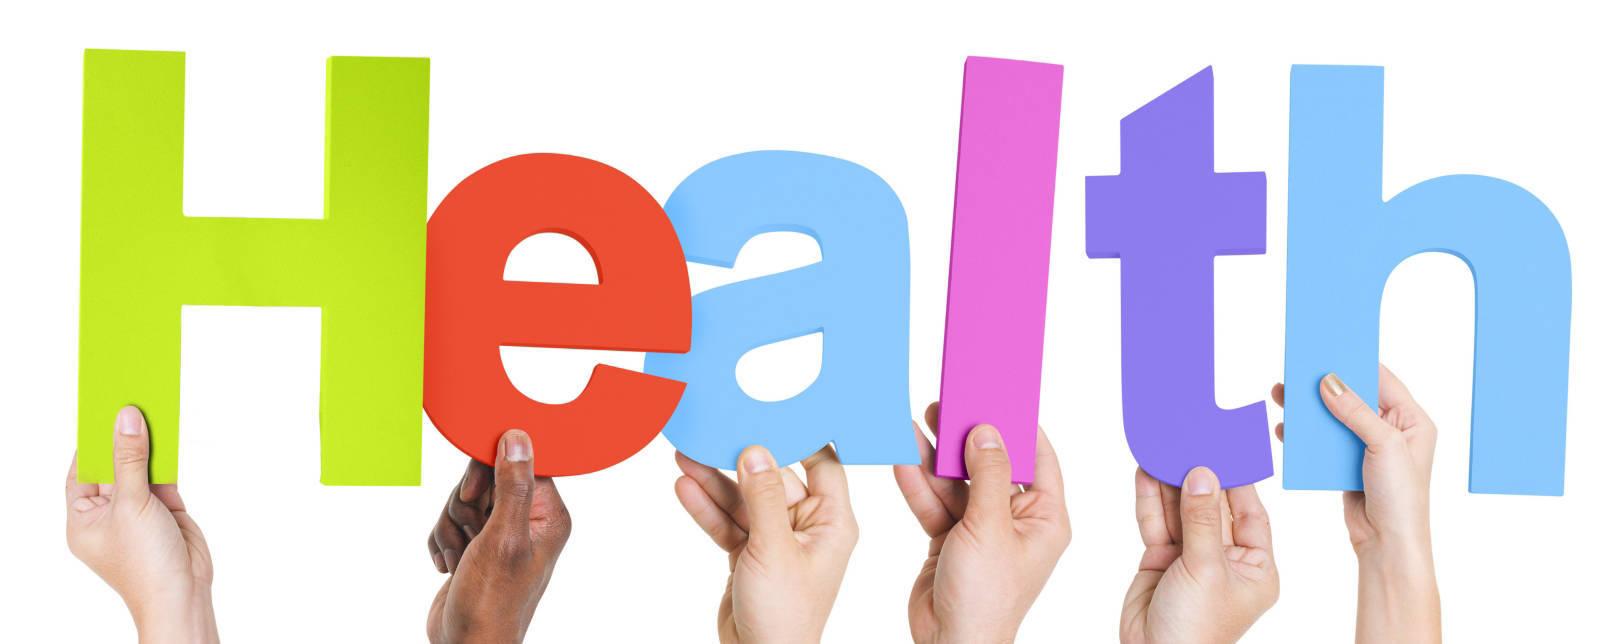 a3c568659bfab2a2f176_health.jpg